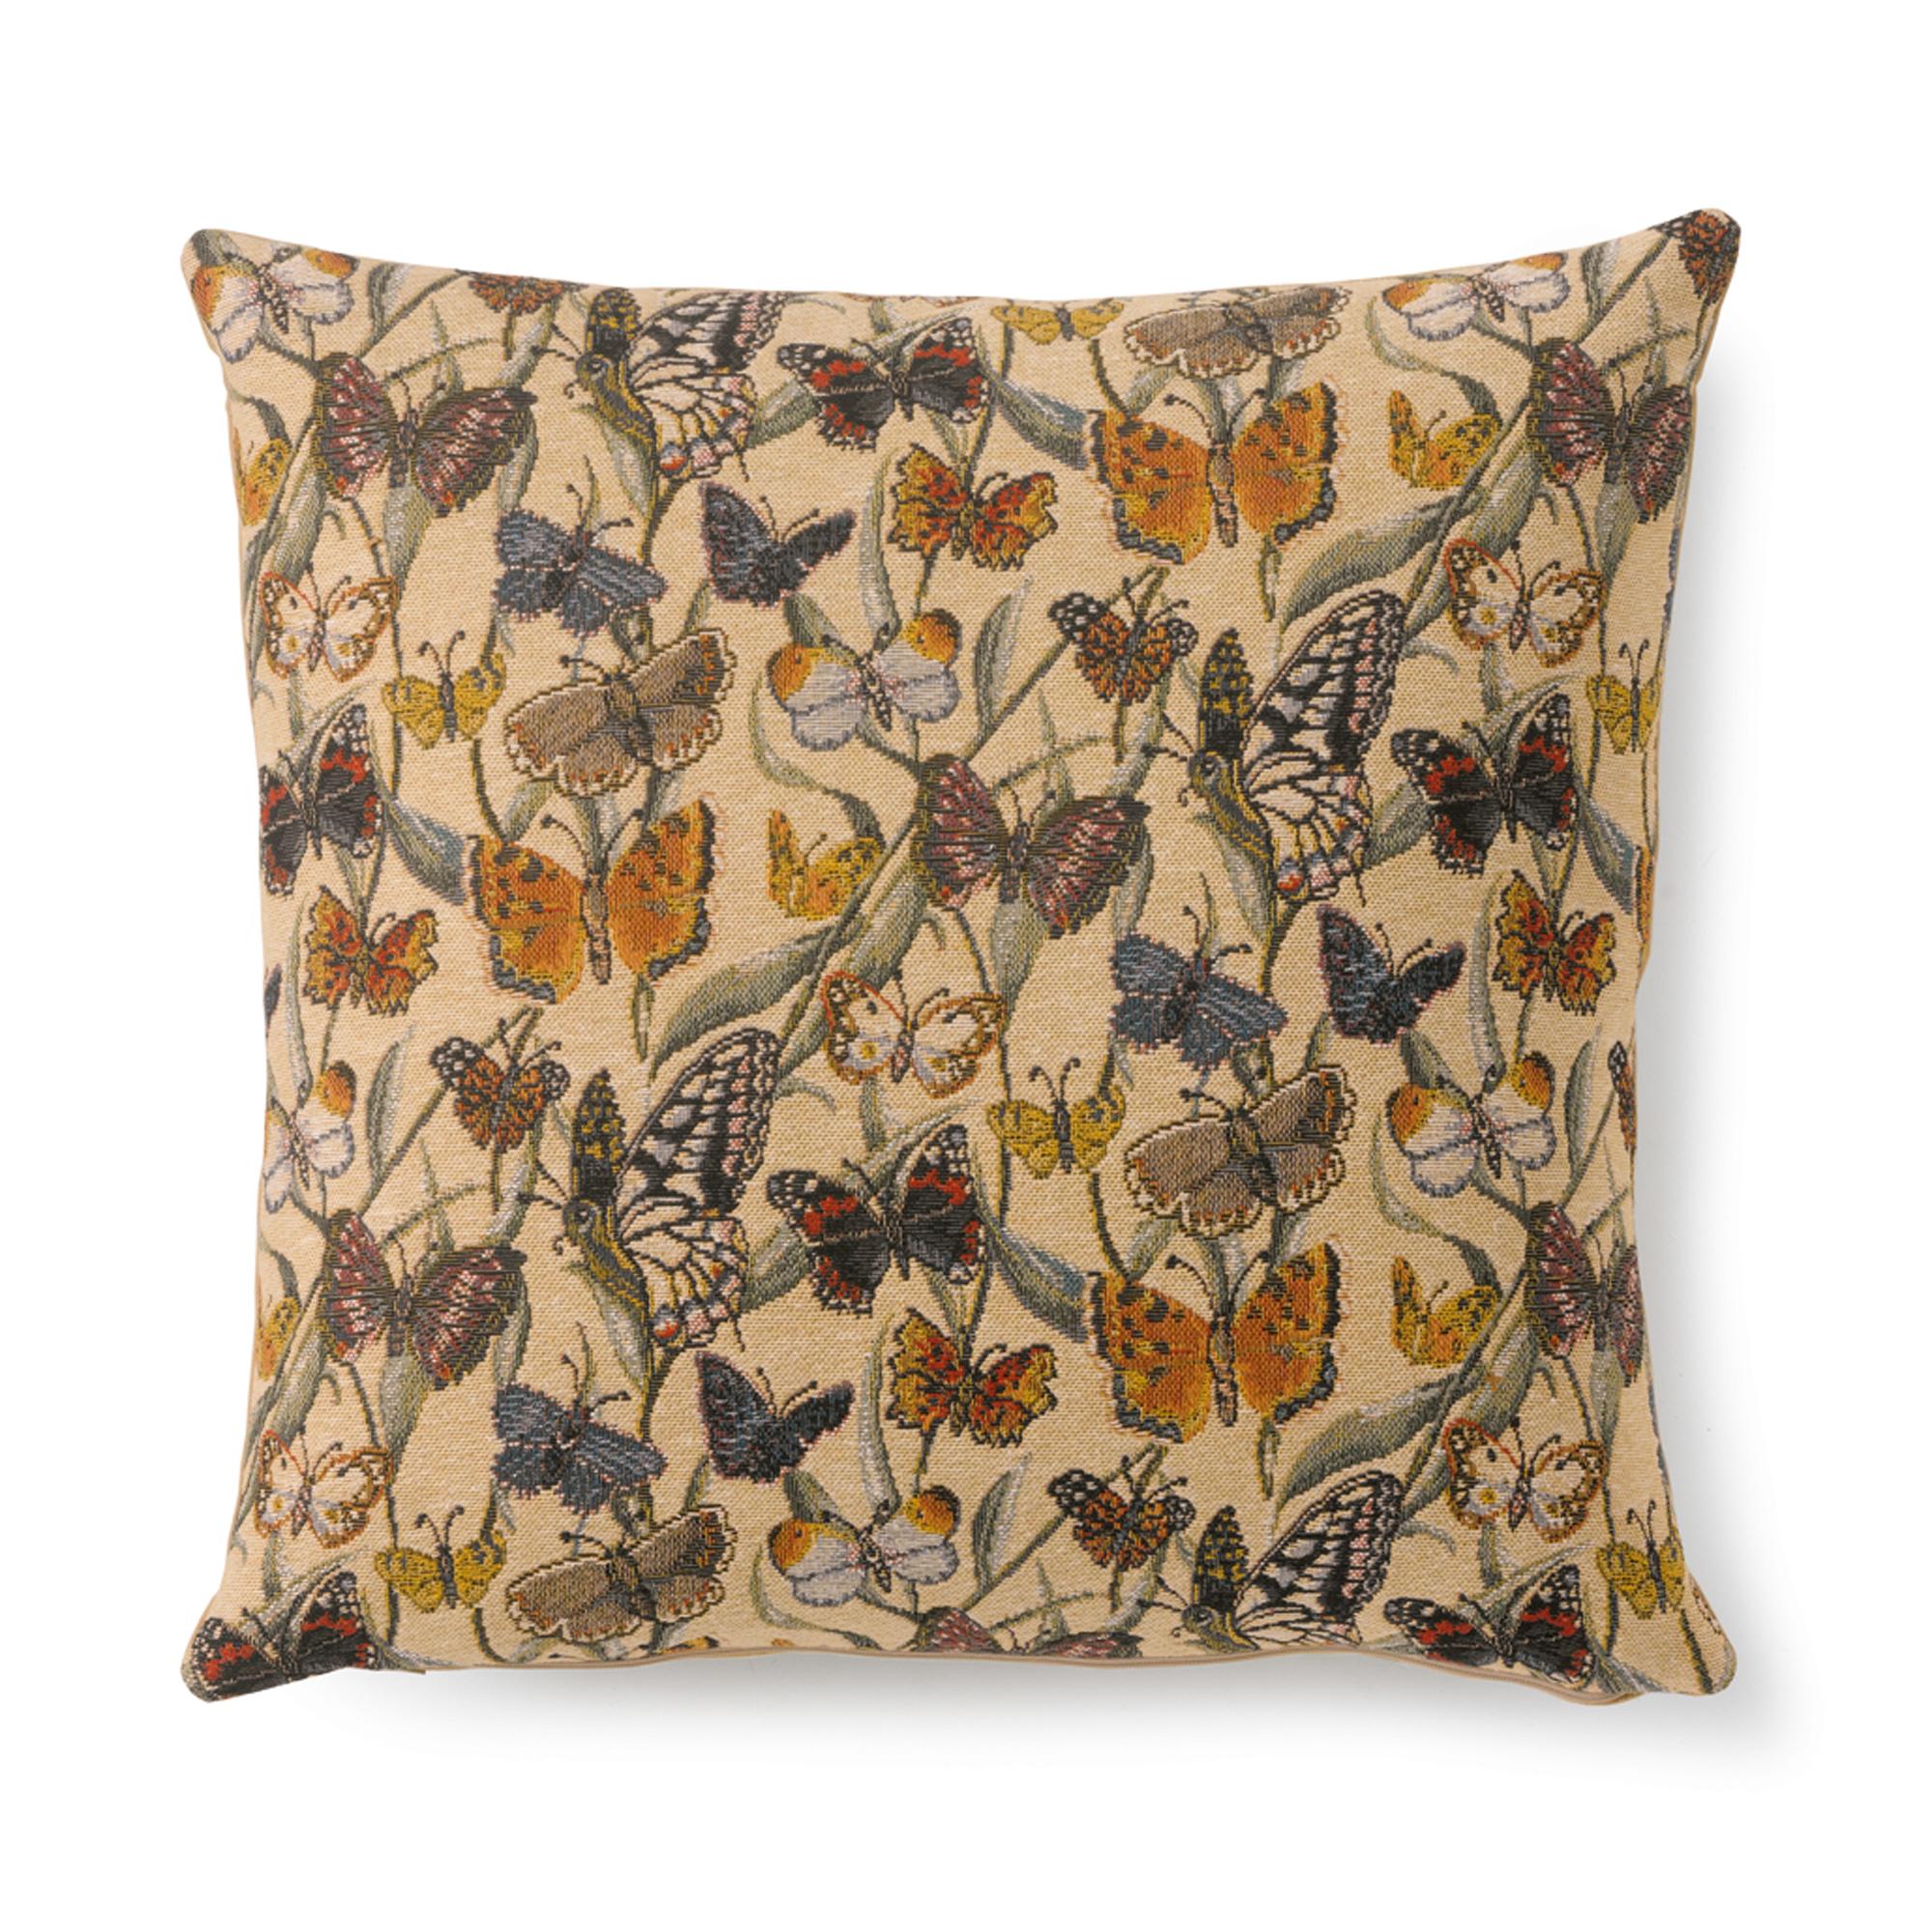 Throw Pillows Home : Jardin Des Papillons Pillow Gump s